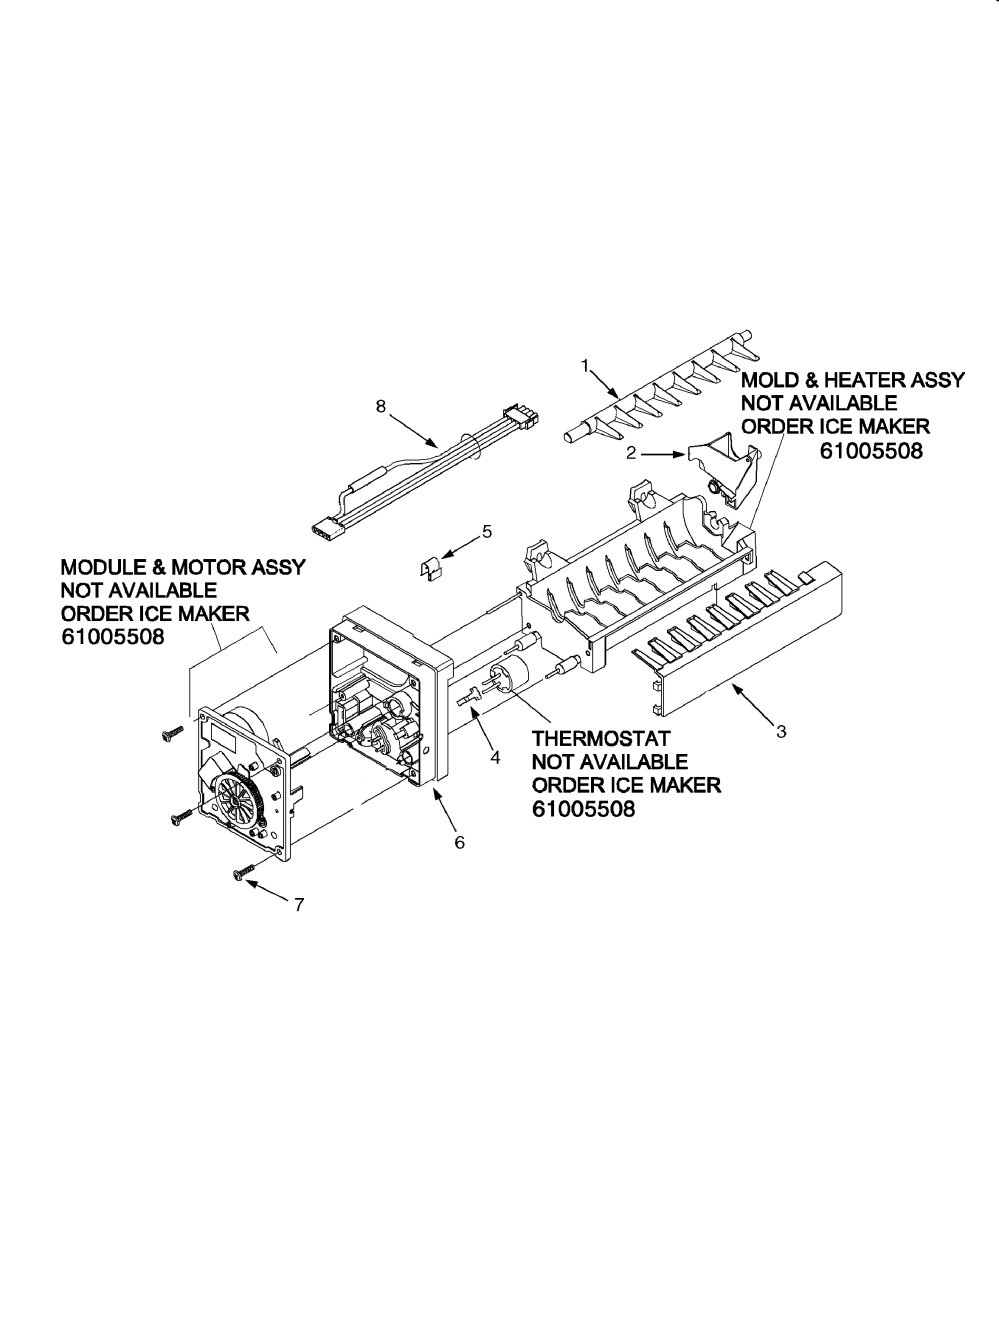 medium resolution of maytag ice maker wiring diagram all wiring diagramwrg 1056 amana ice maker wiring diagram maytag